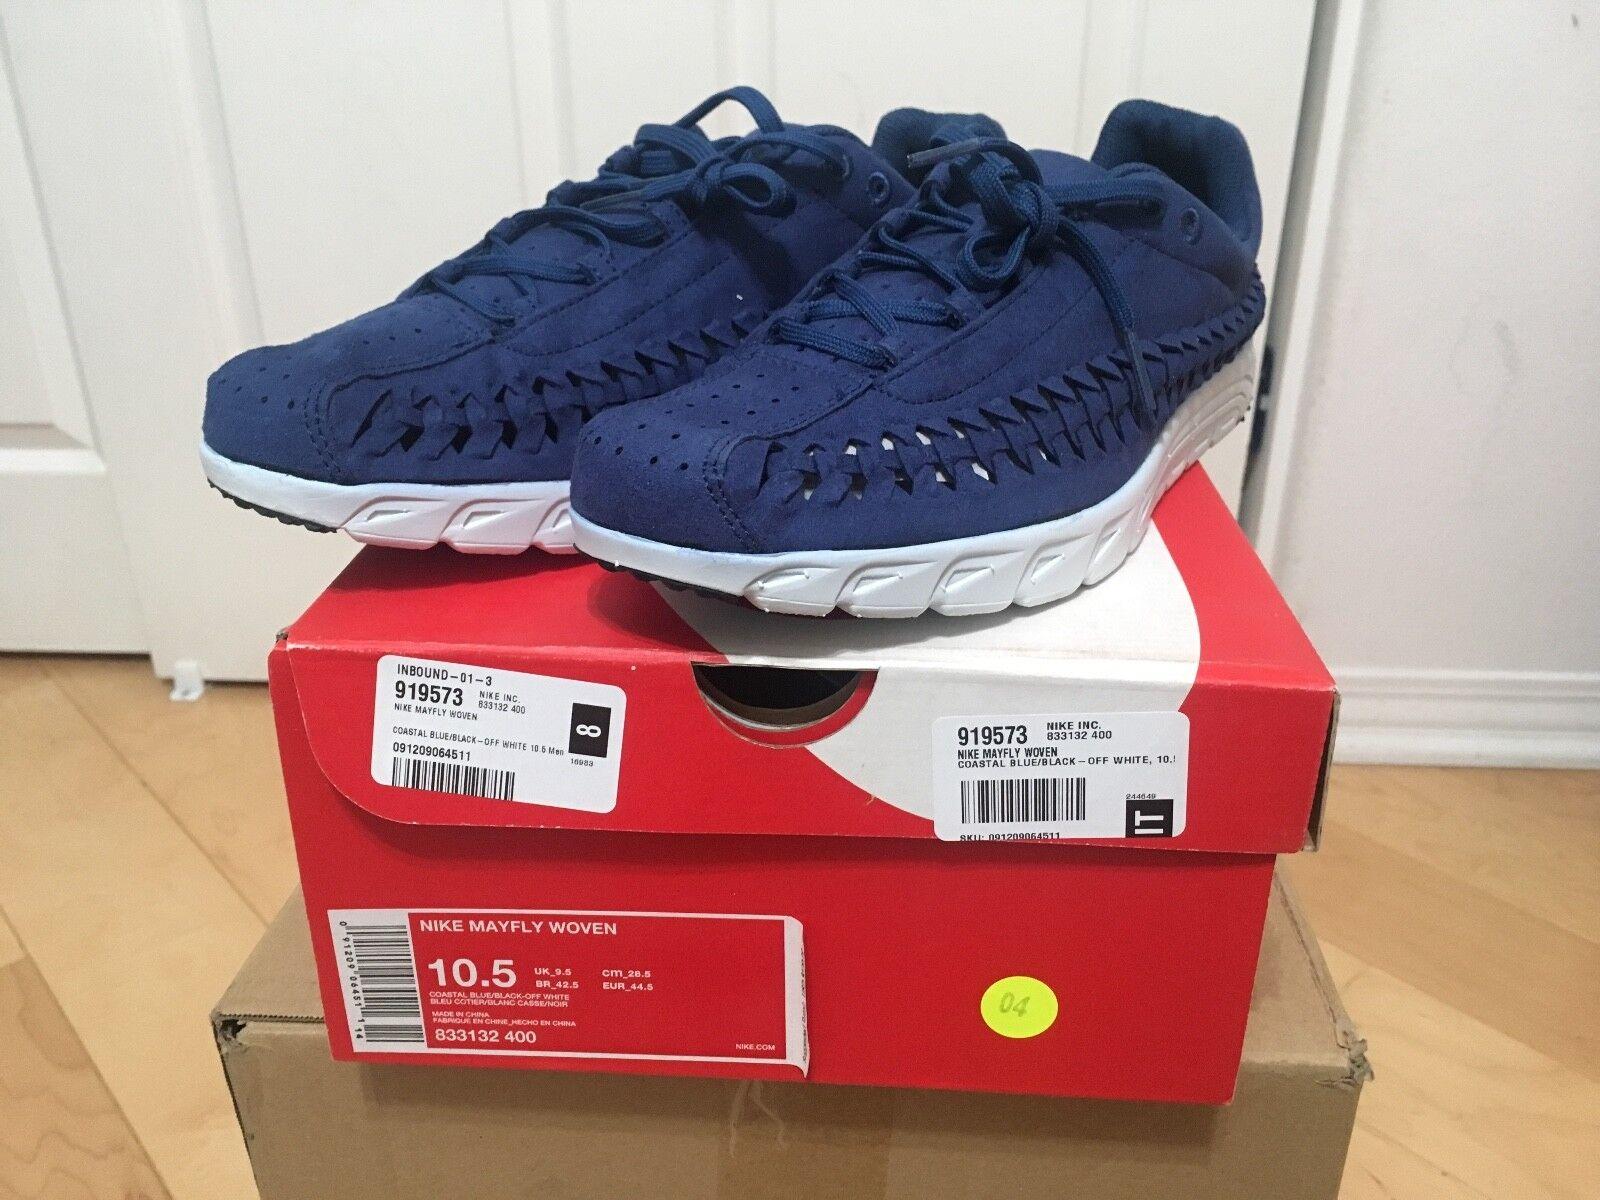 Nike Mayfly Woven Coastal bluee Men's size 10.5 Light Weight Comfortable